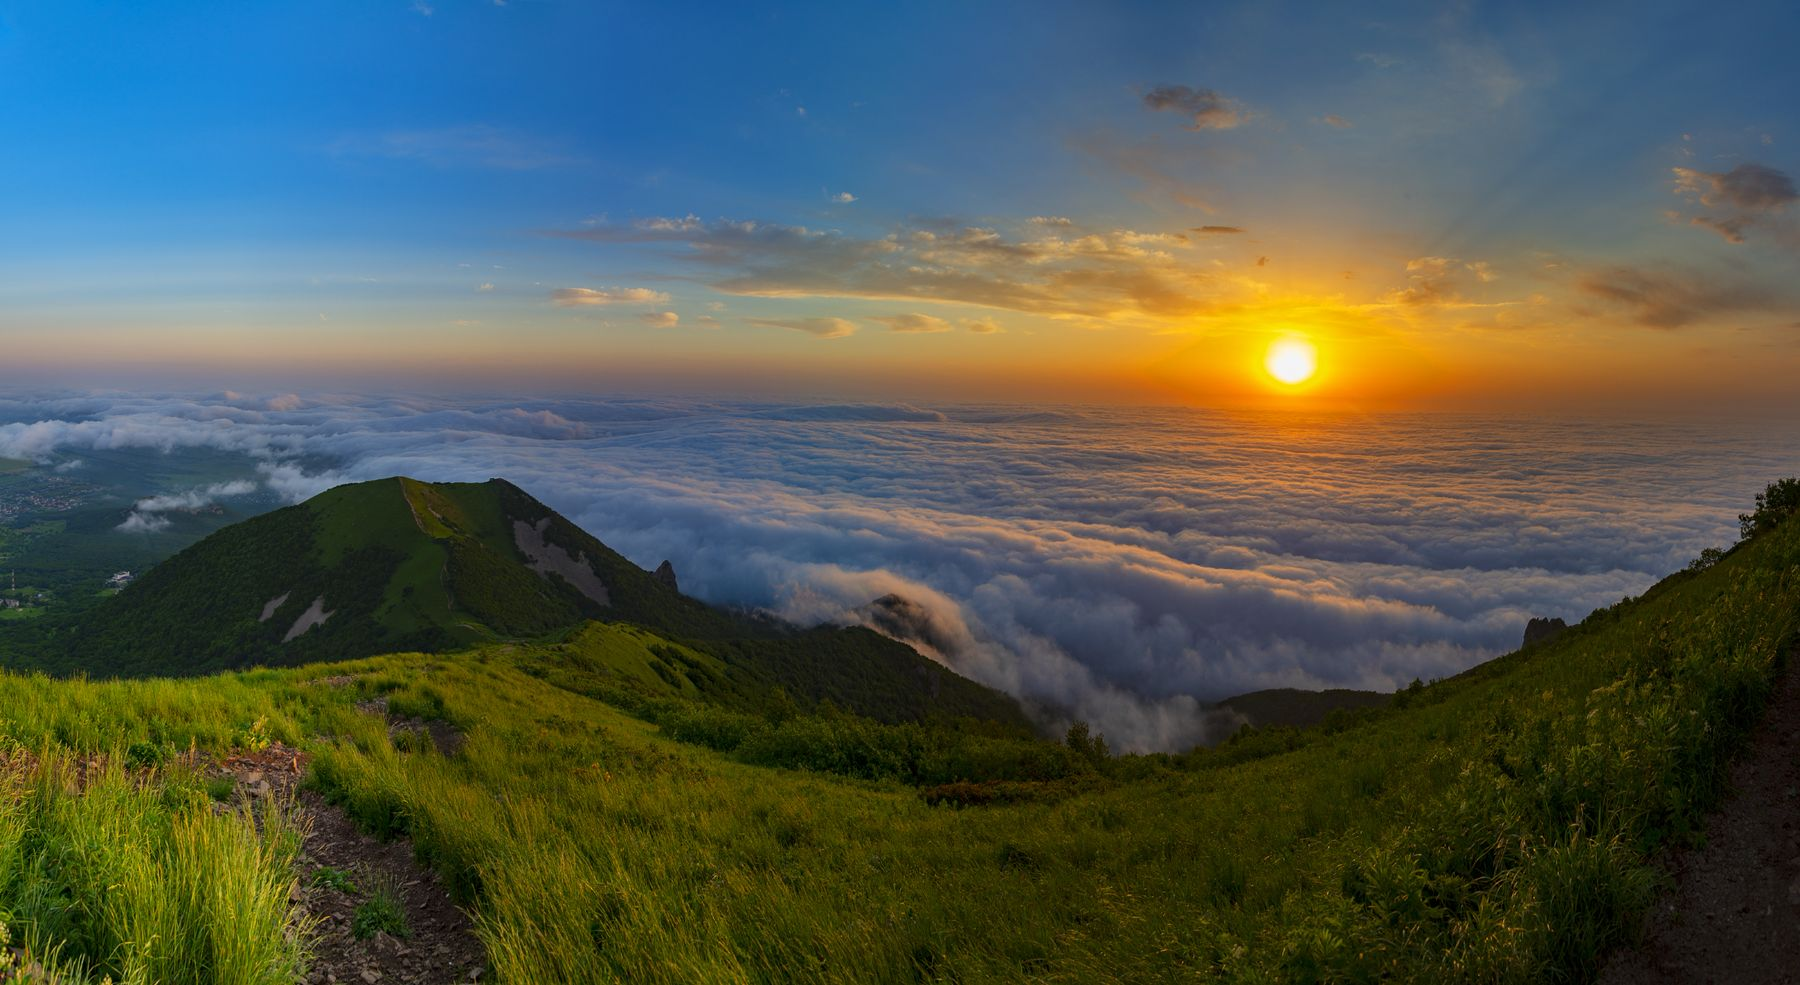 Дорога в облака облака бештау утро кмв природа пейзаж